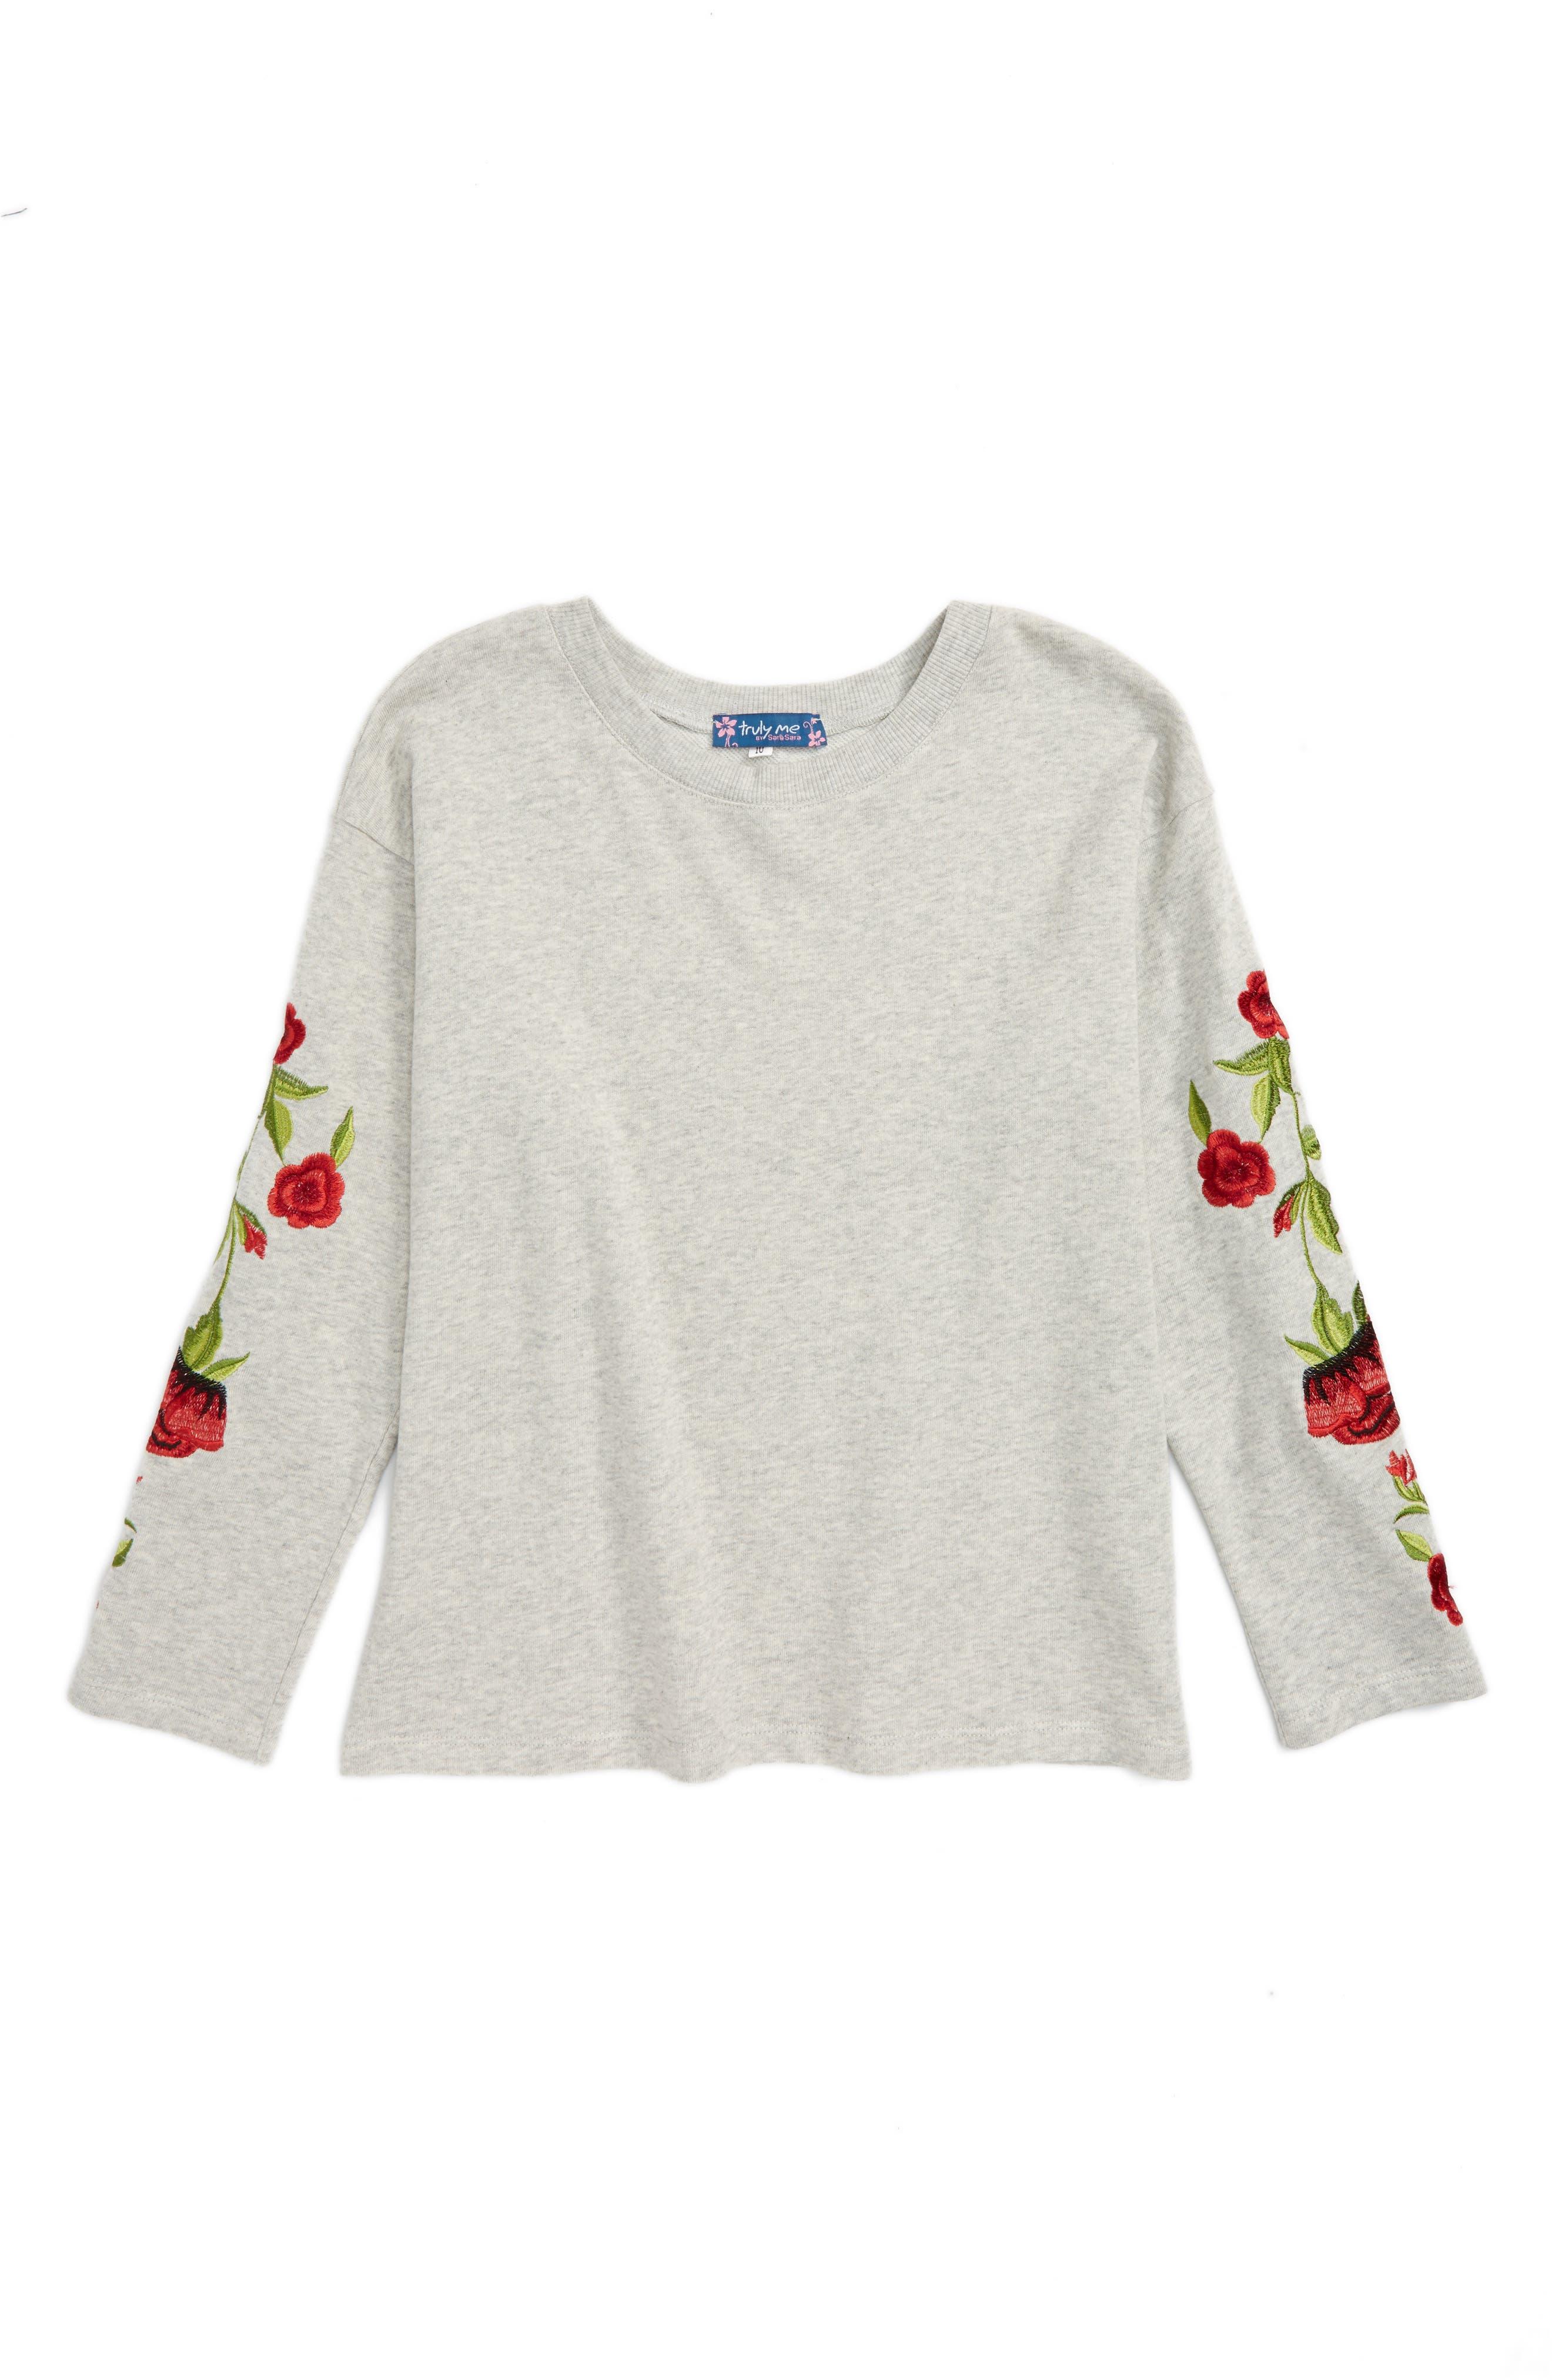 Main Image - Truly Me Embroidered Sweatshirt (Big Girls)